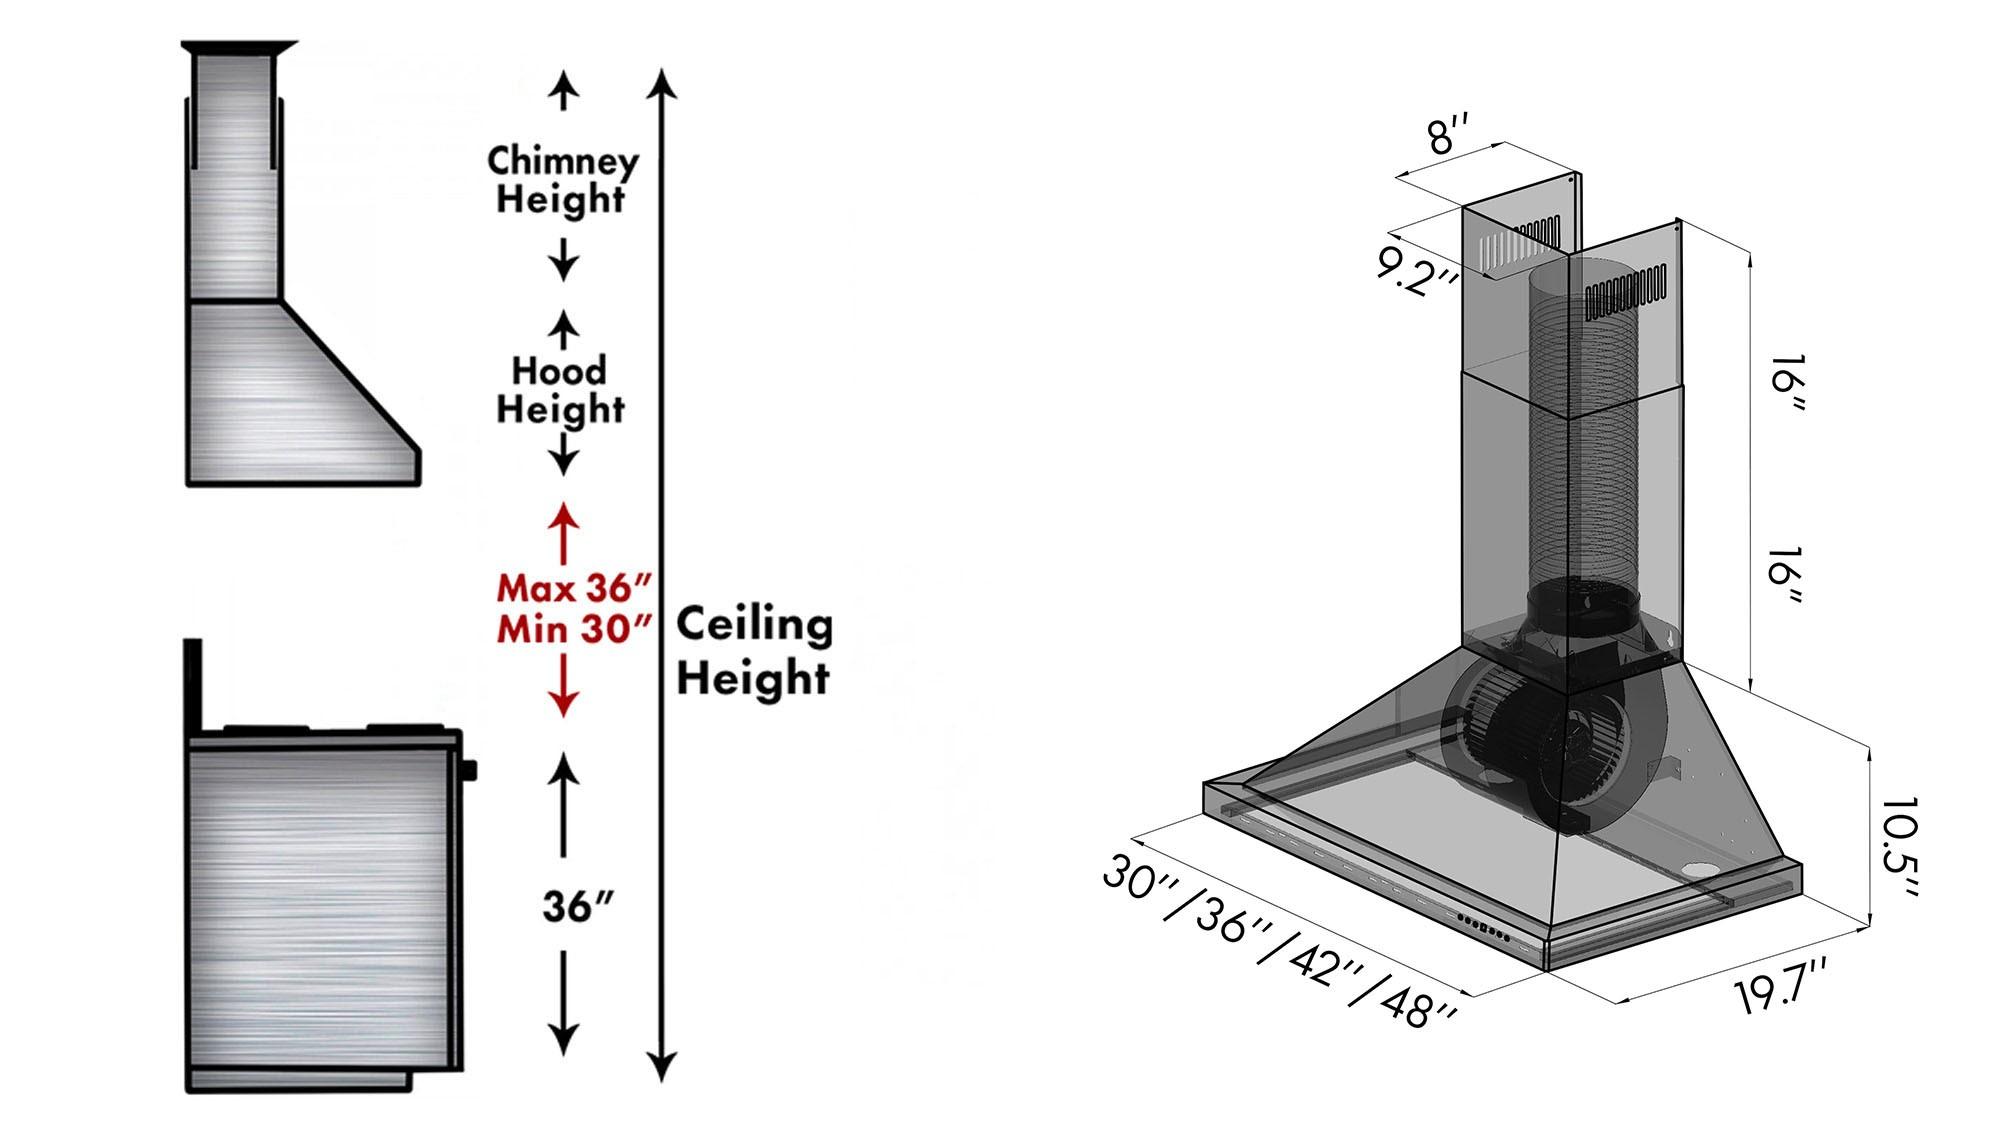 zline-stainless-steel-wall-mounted-range-hood-kb-graphic-new.jpg